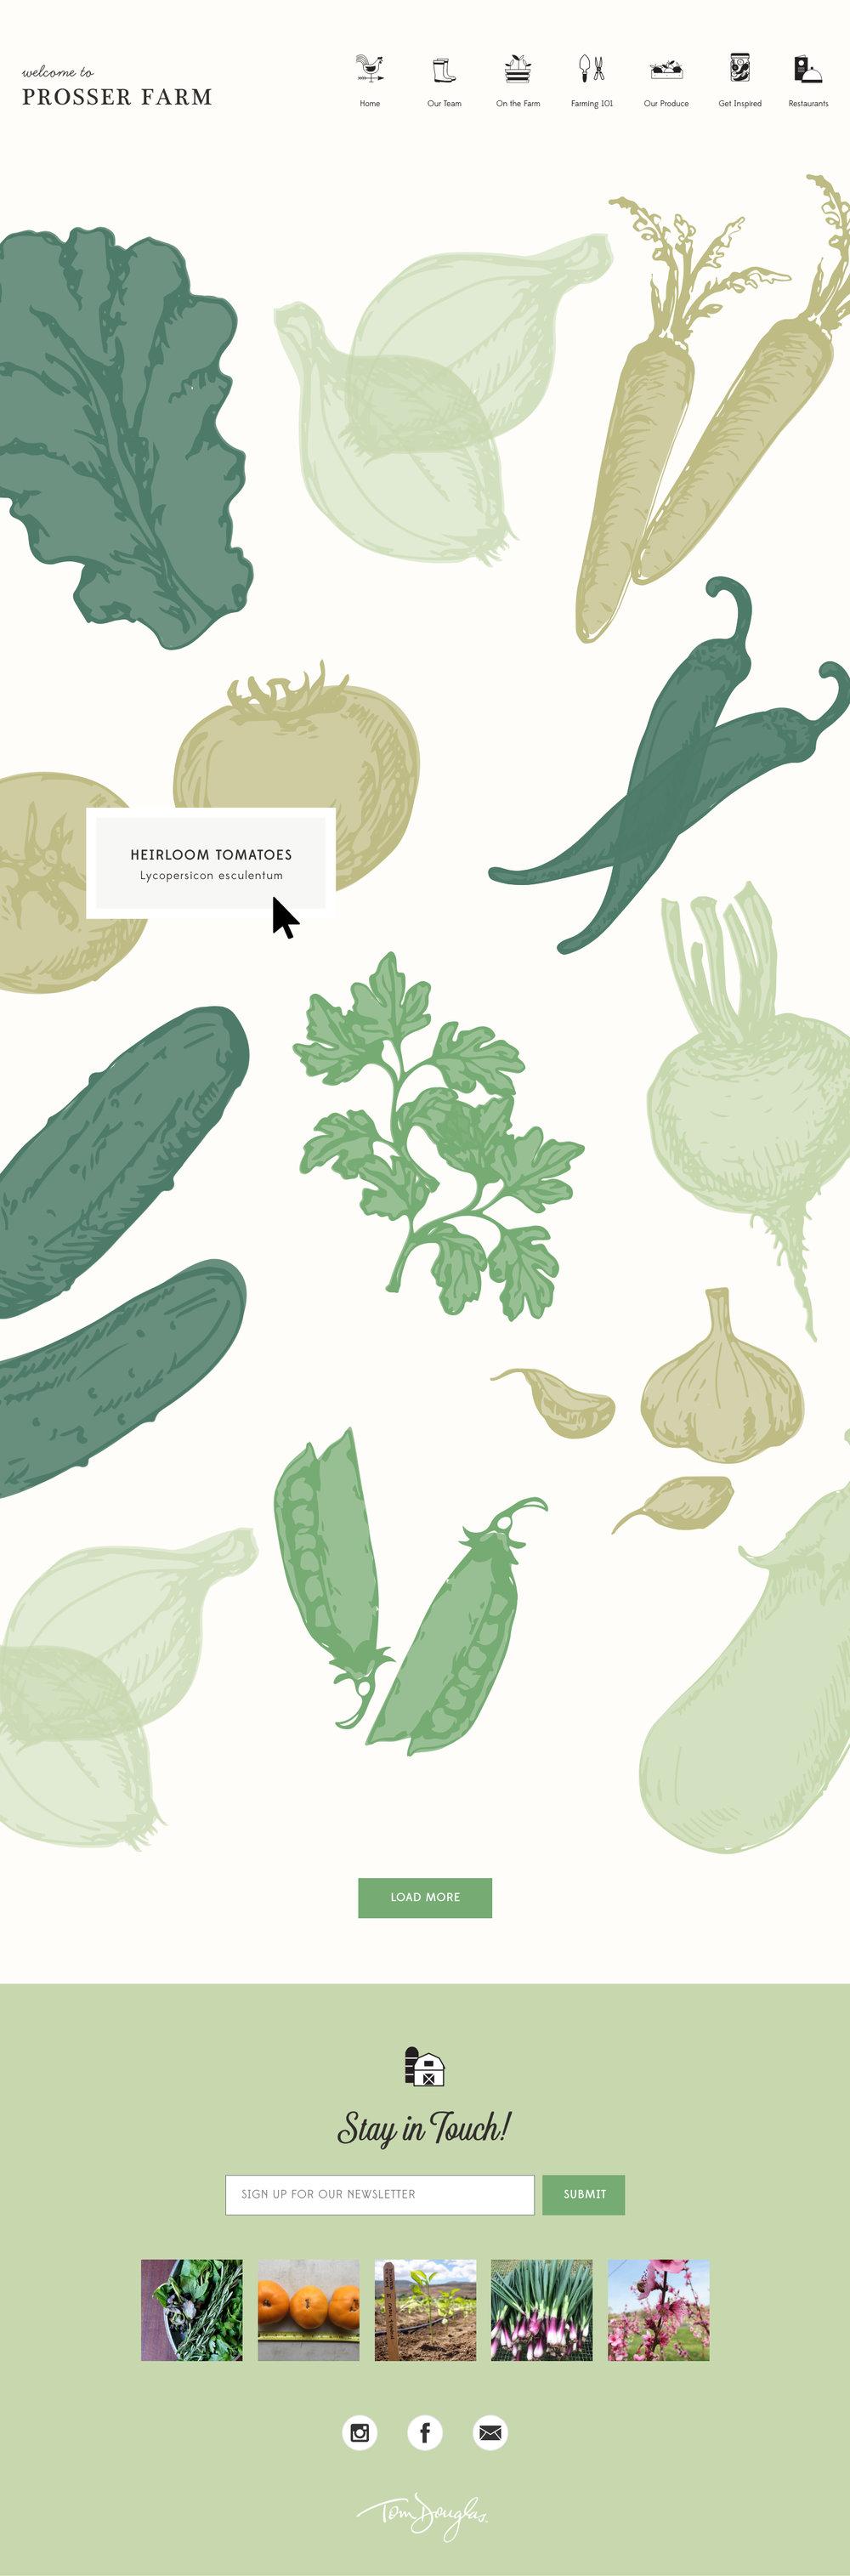 Produce Page.jpg